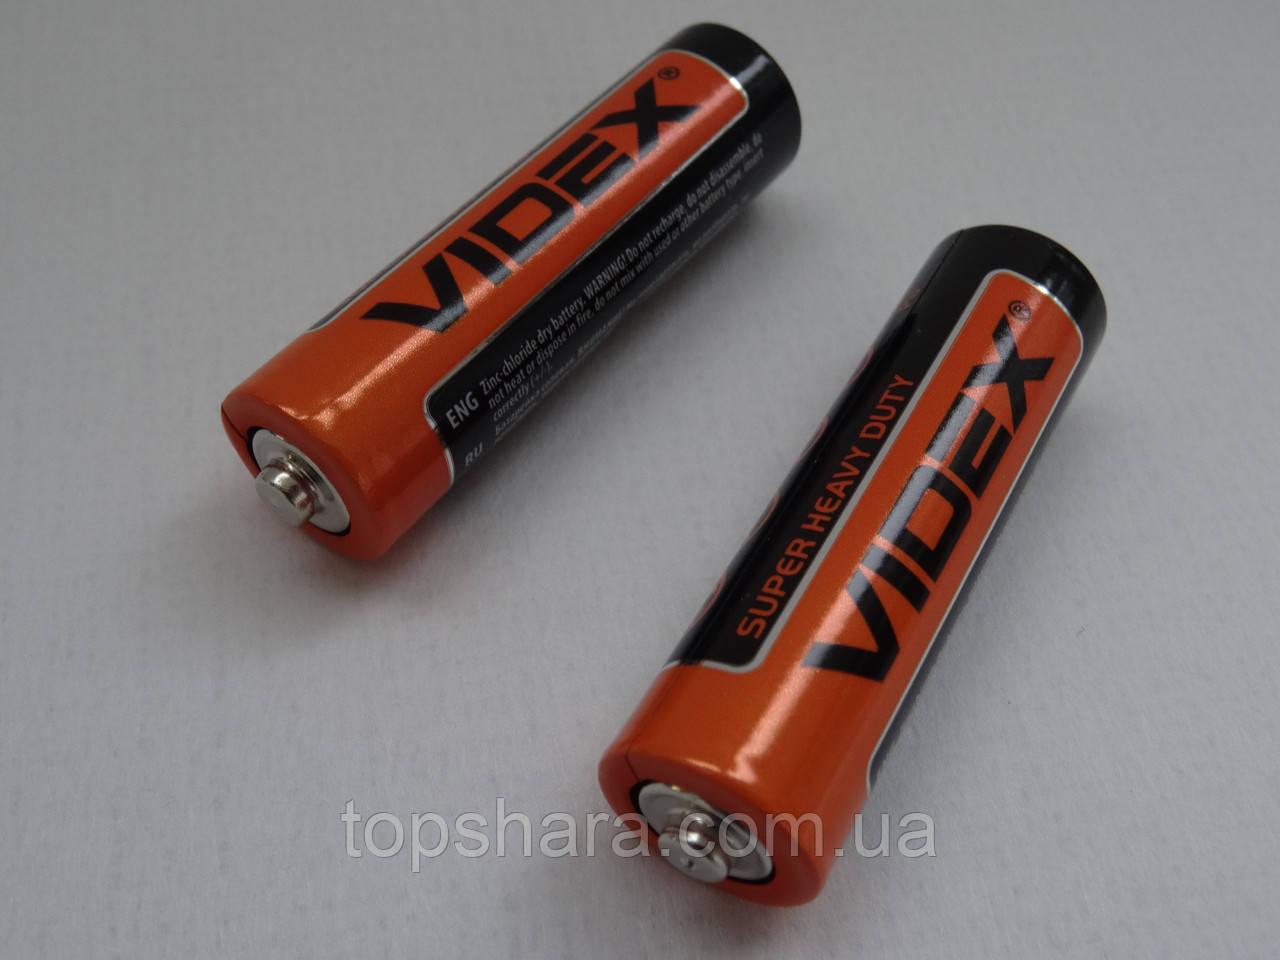 R6P Батарейки Videx AA, солевые  1.5V  (2 шт)